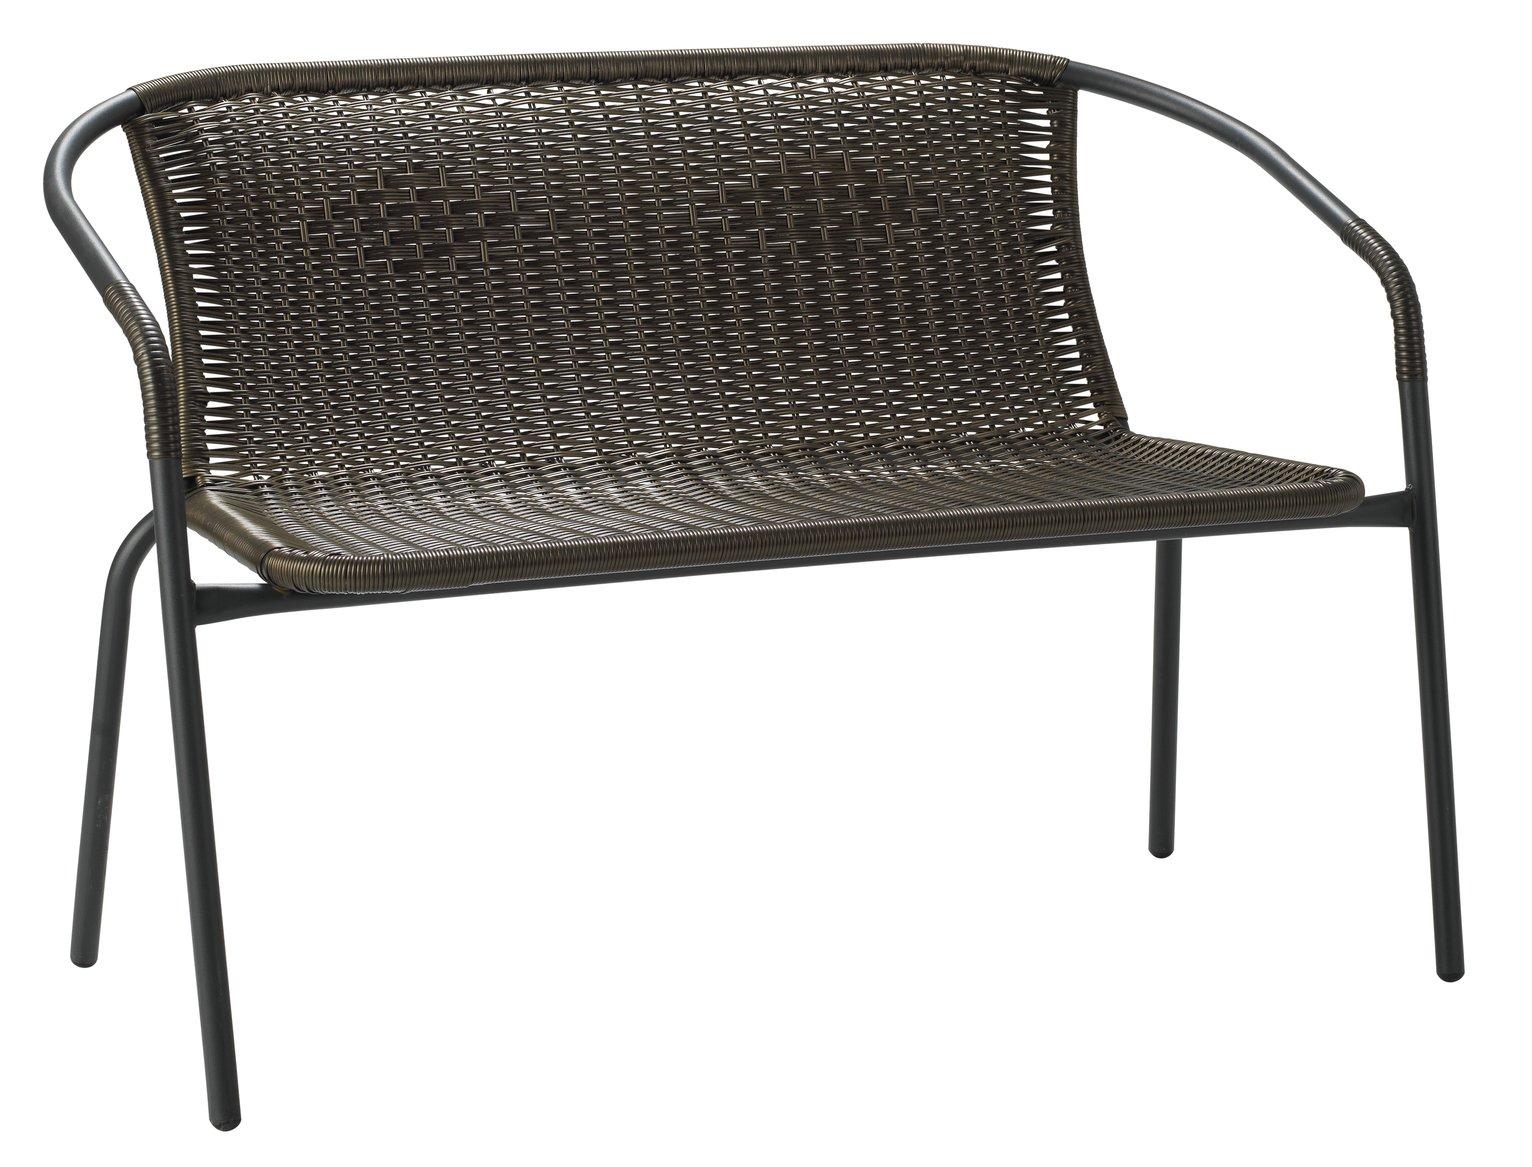 Buy Argos Home Steel 2 Seater Garden Bench   Brown | Garden Benches And  Arbours | Argos